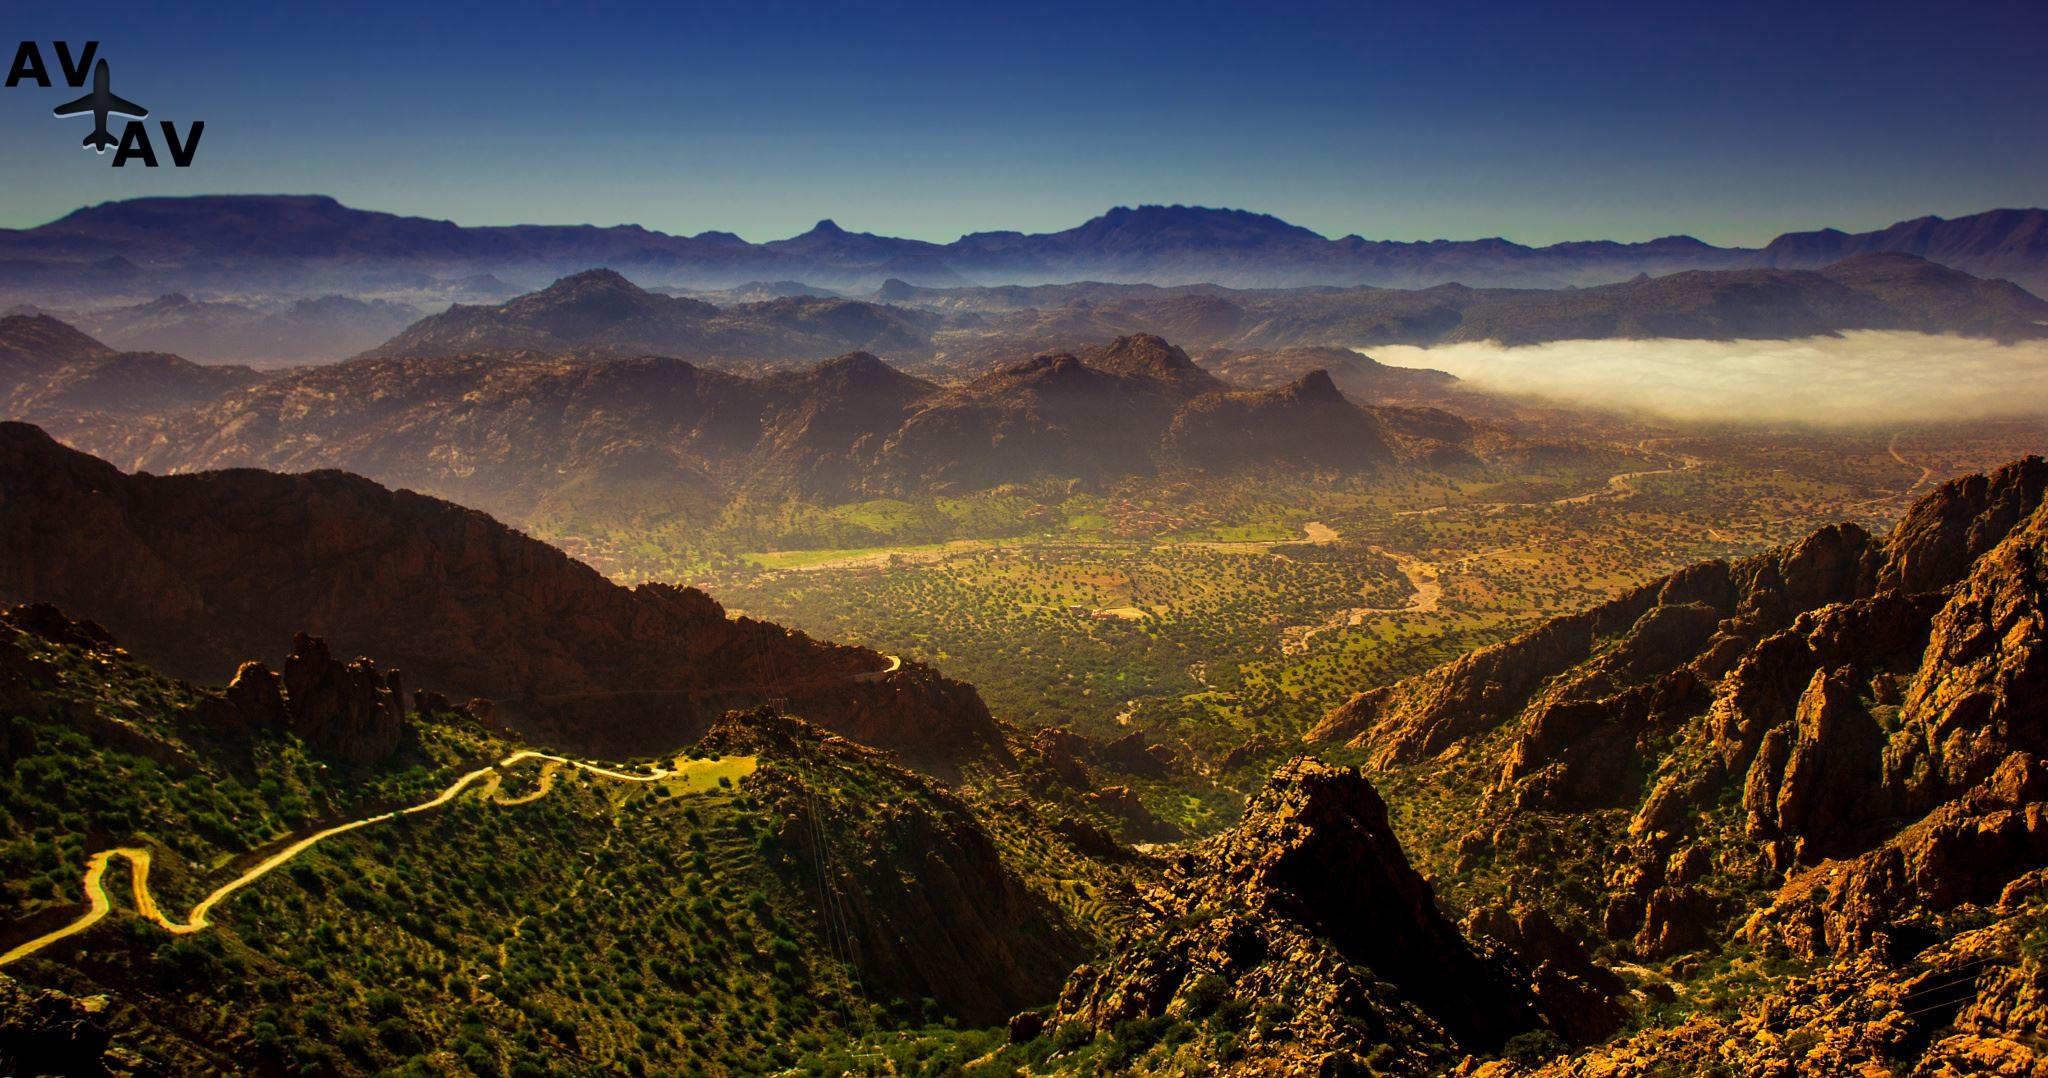 Marokkanskaya SHveytsariya - Марокканская Швейцария